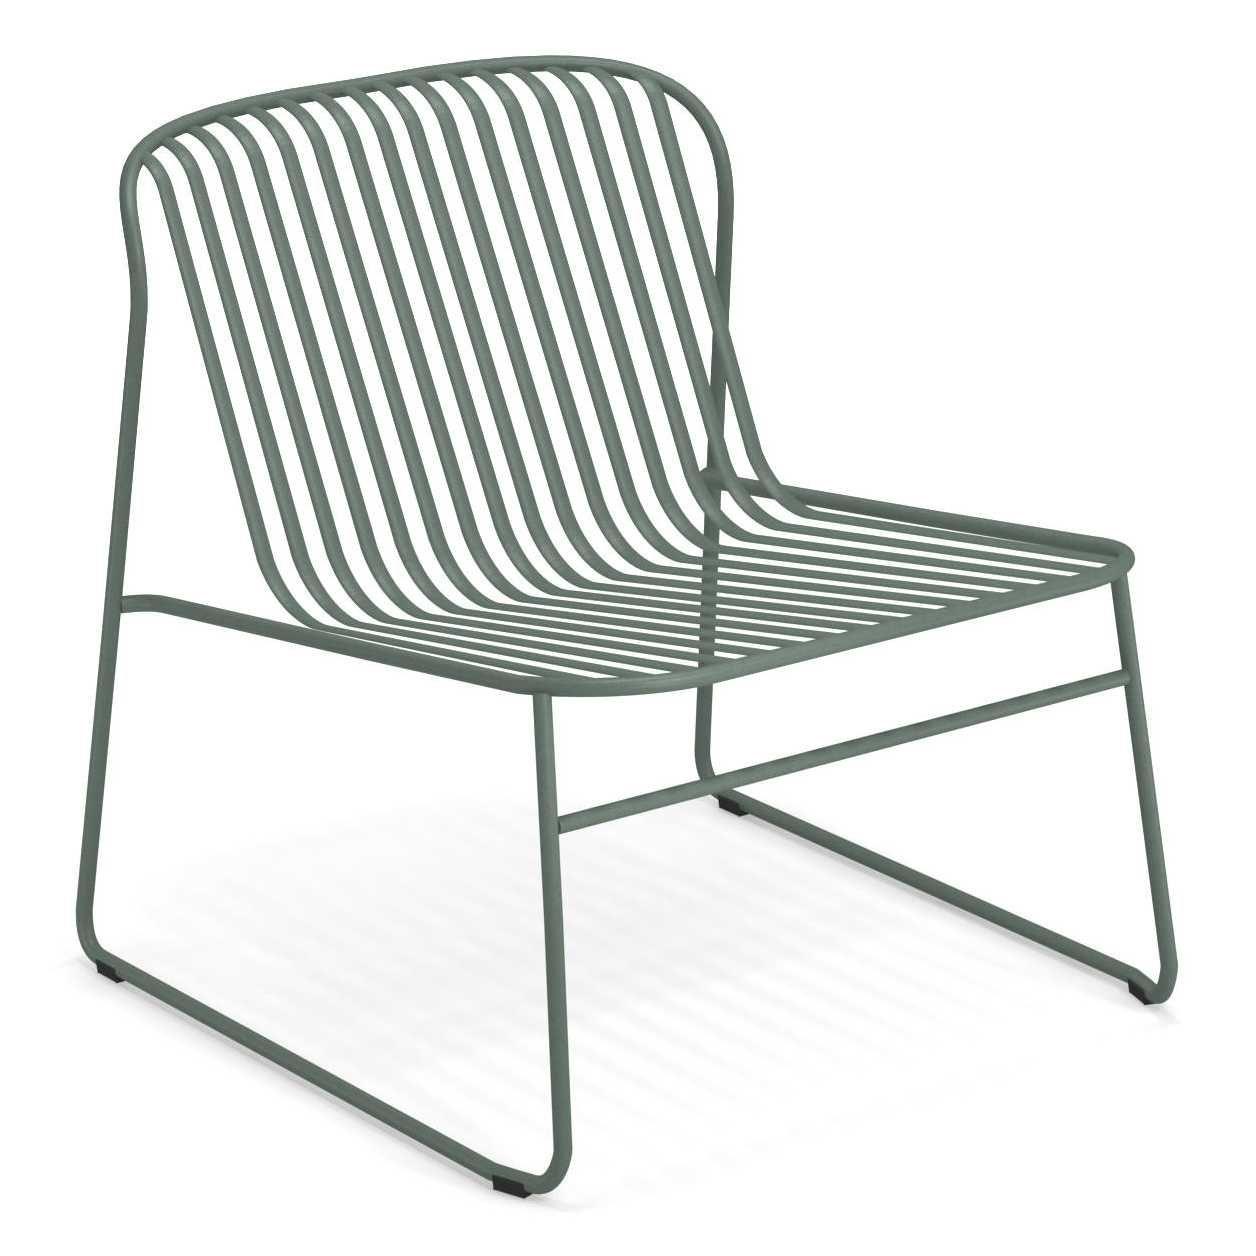 Emu Riviera fauteuil donkergroen